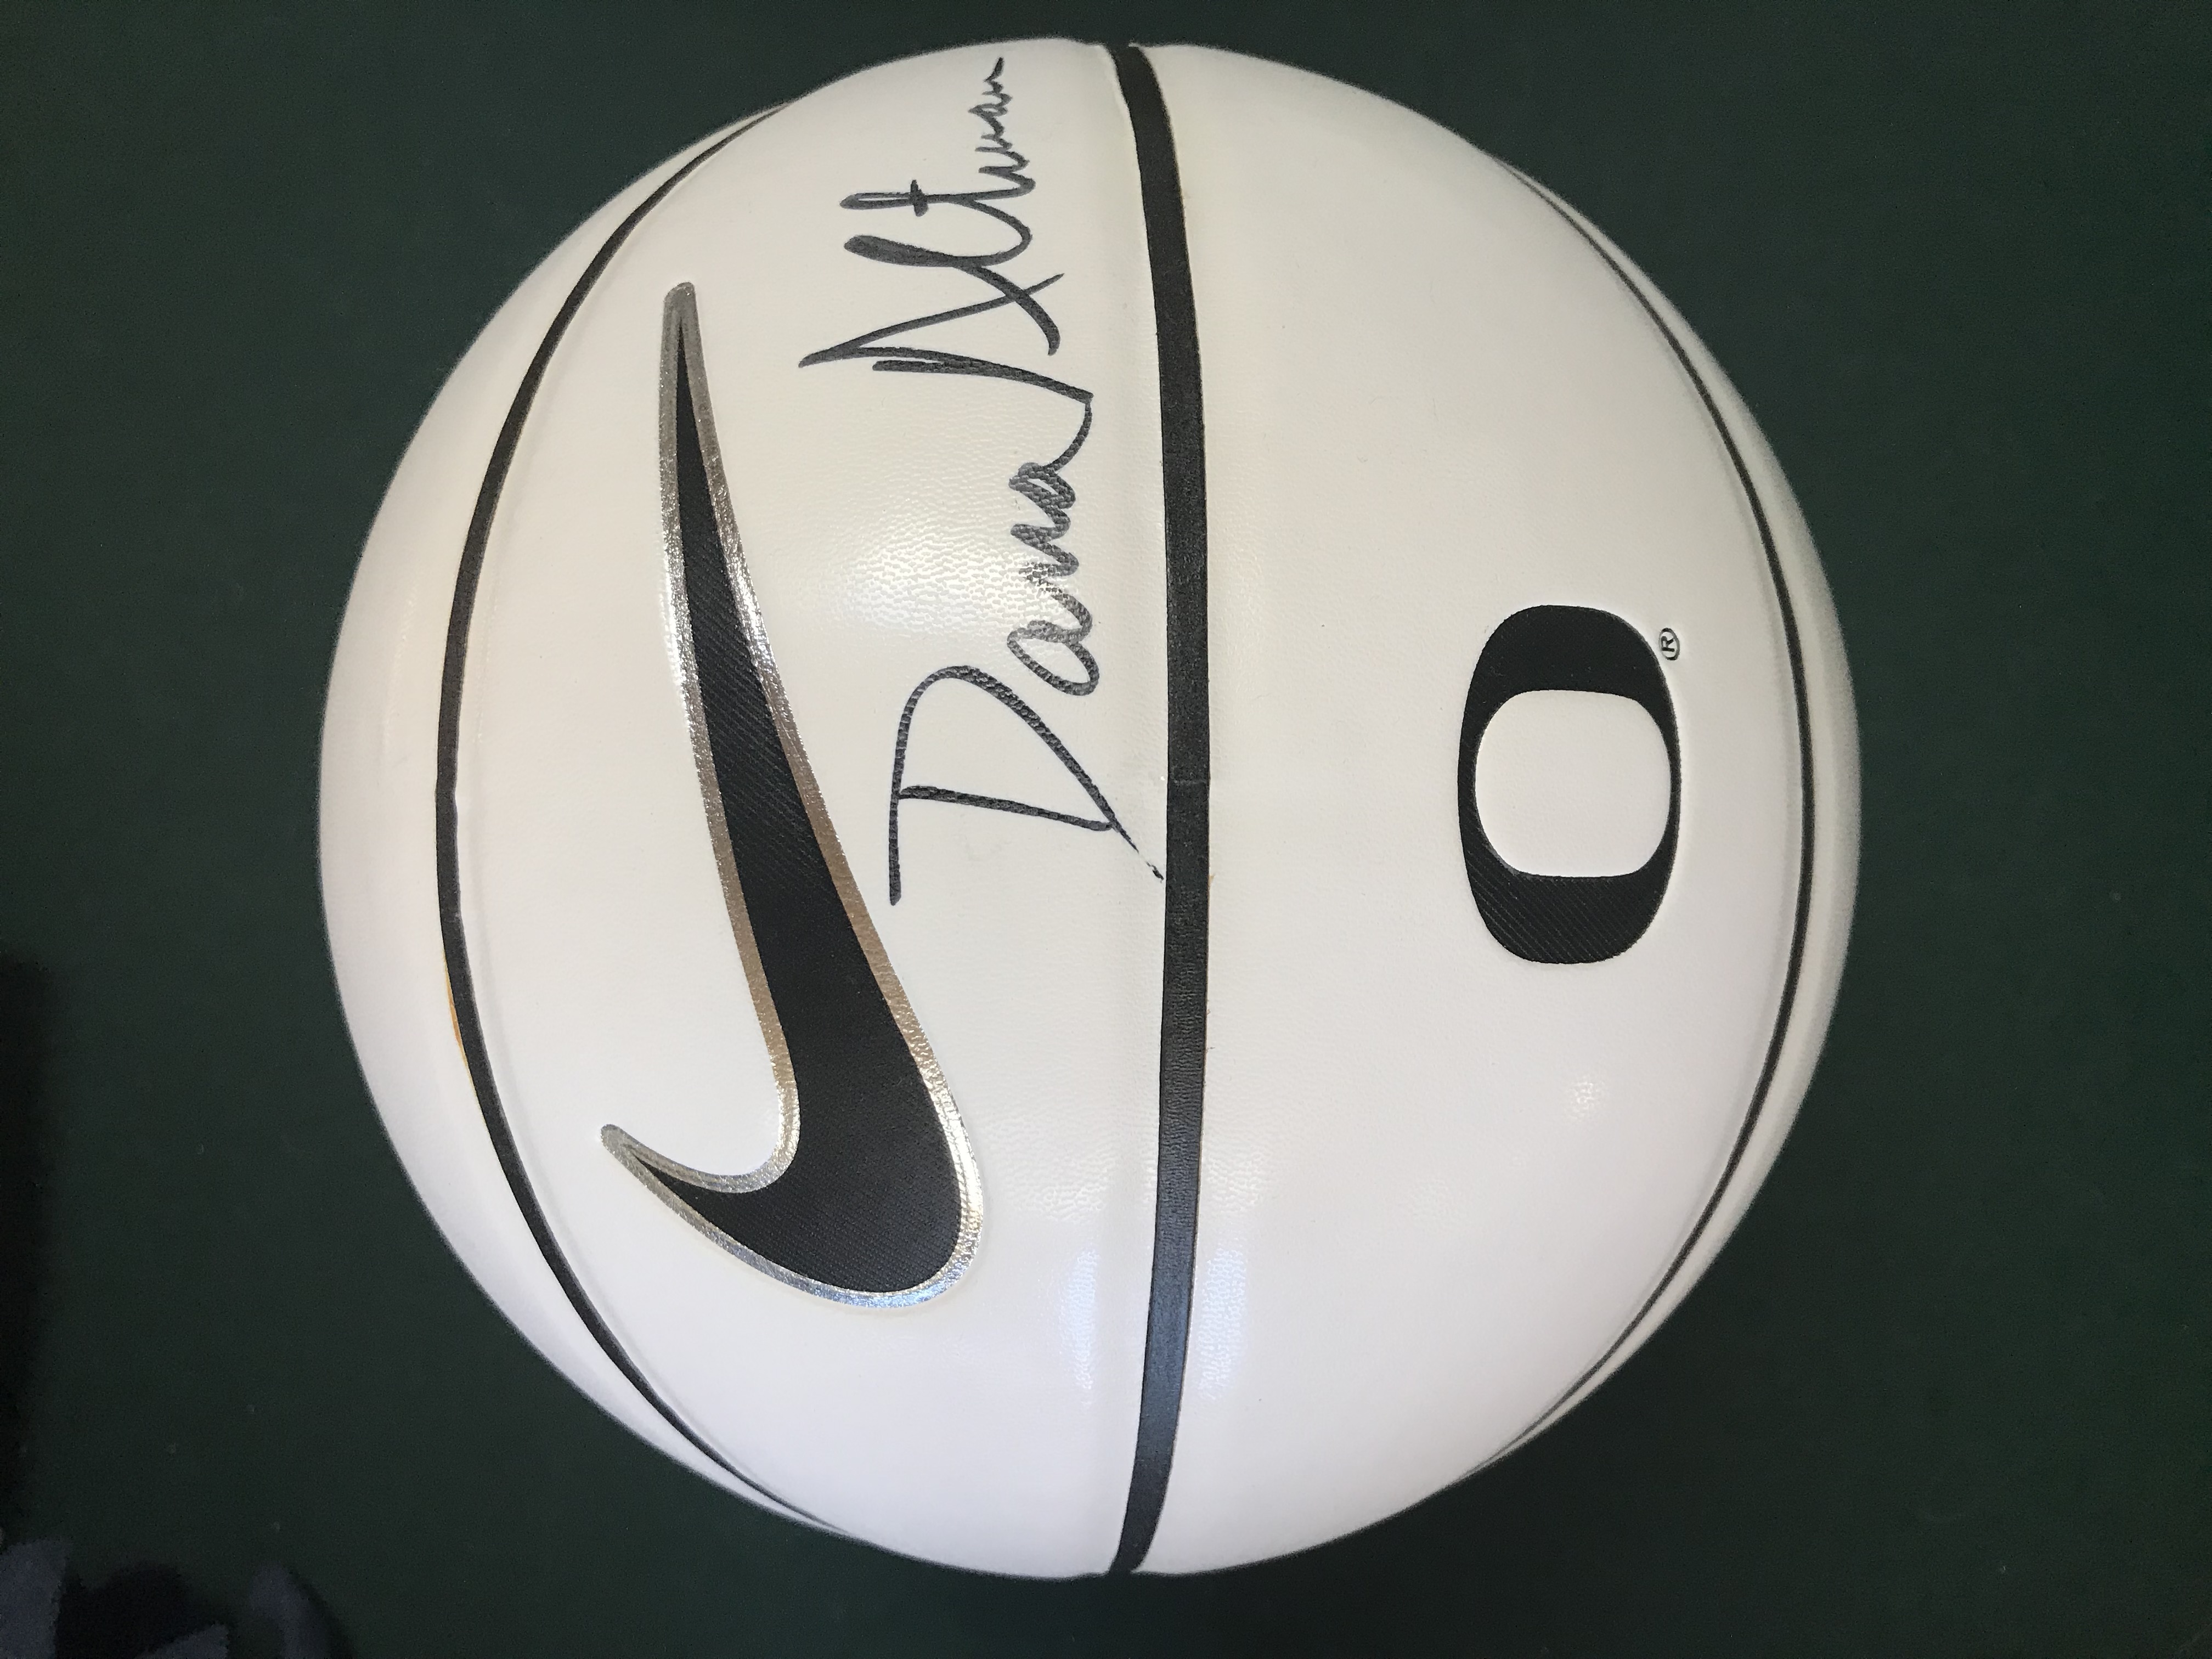 Dana Altman Autographed B-Ball